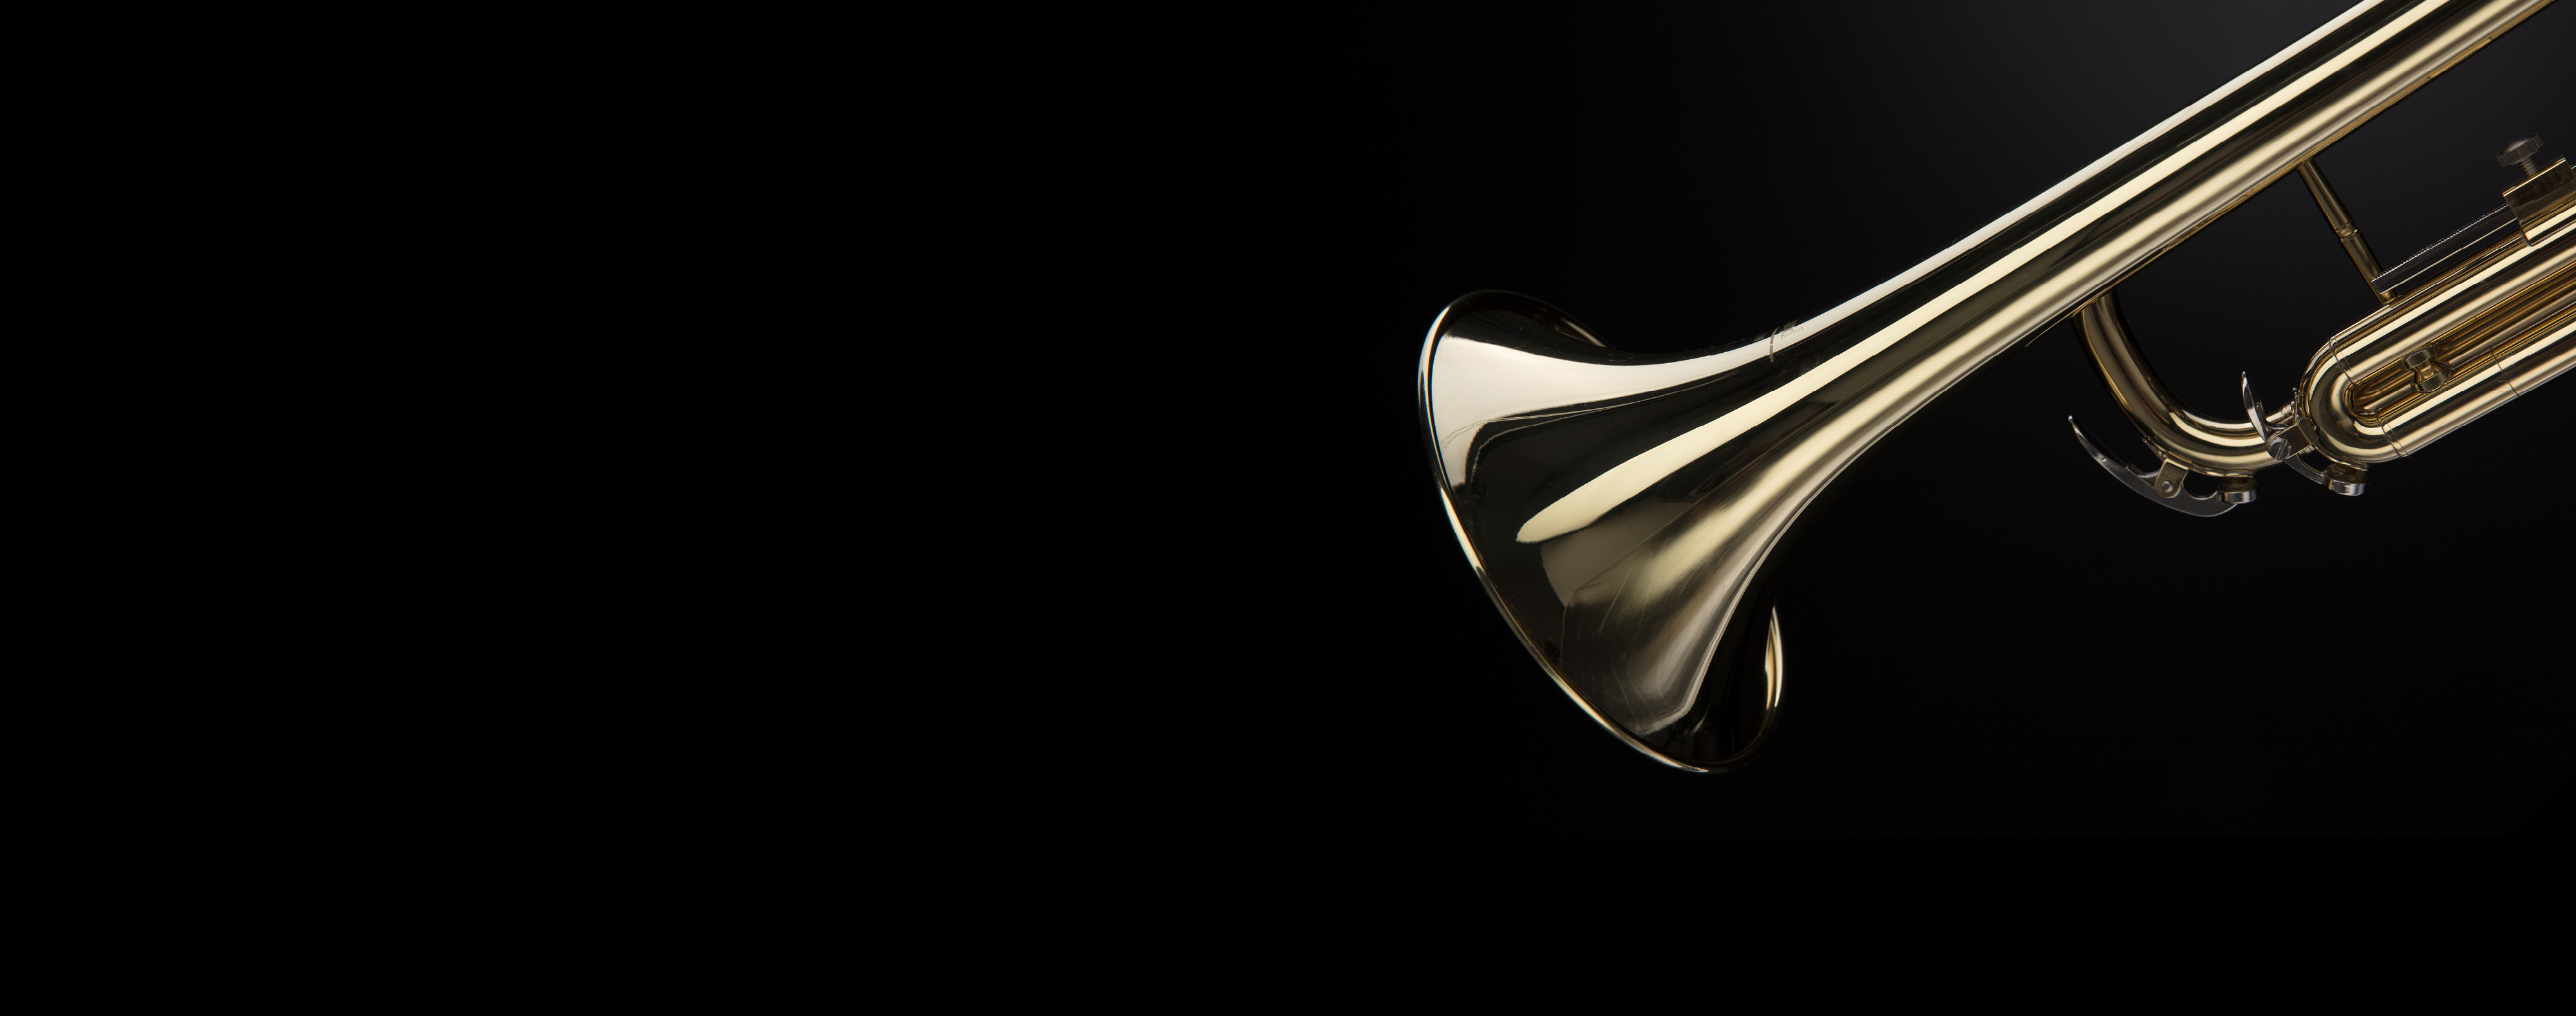 Zetland Trumpet